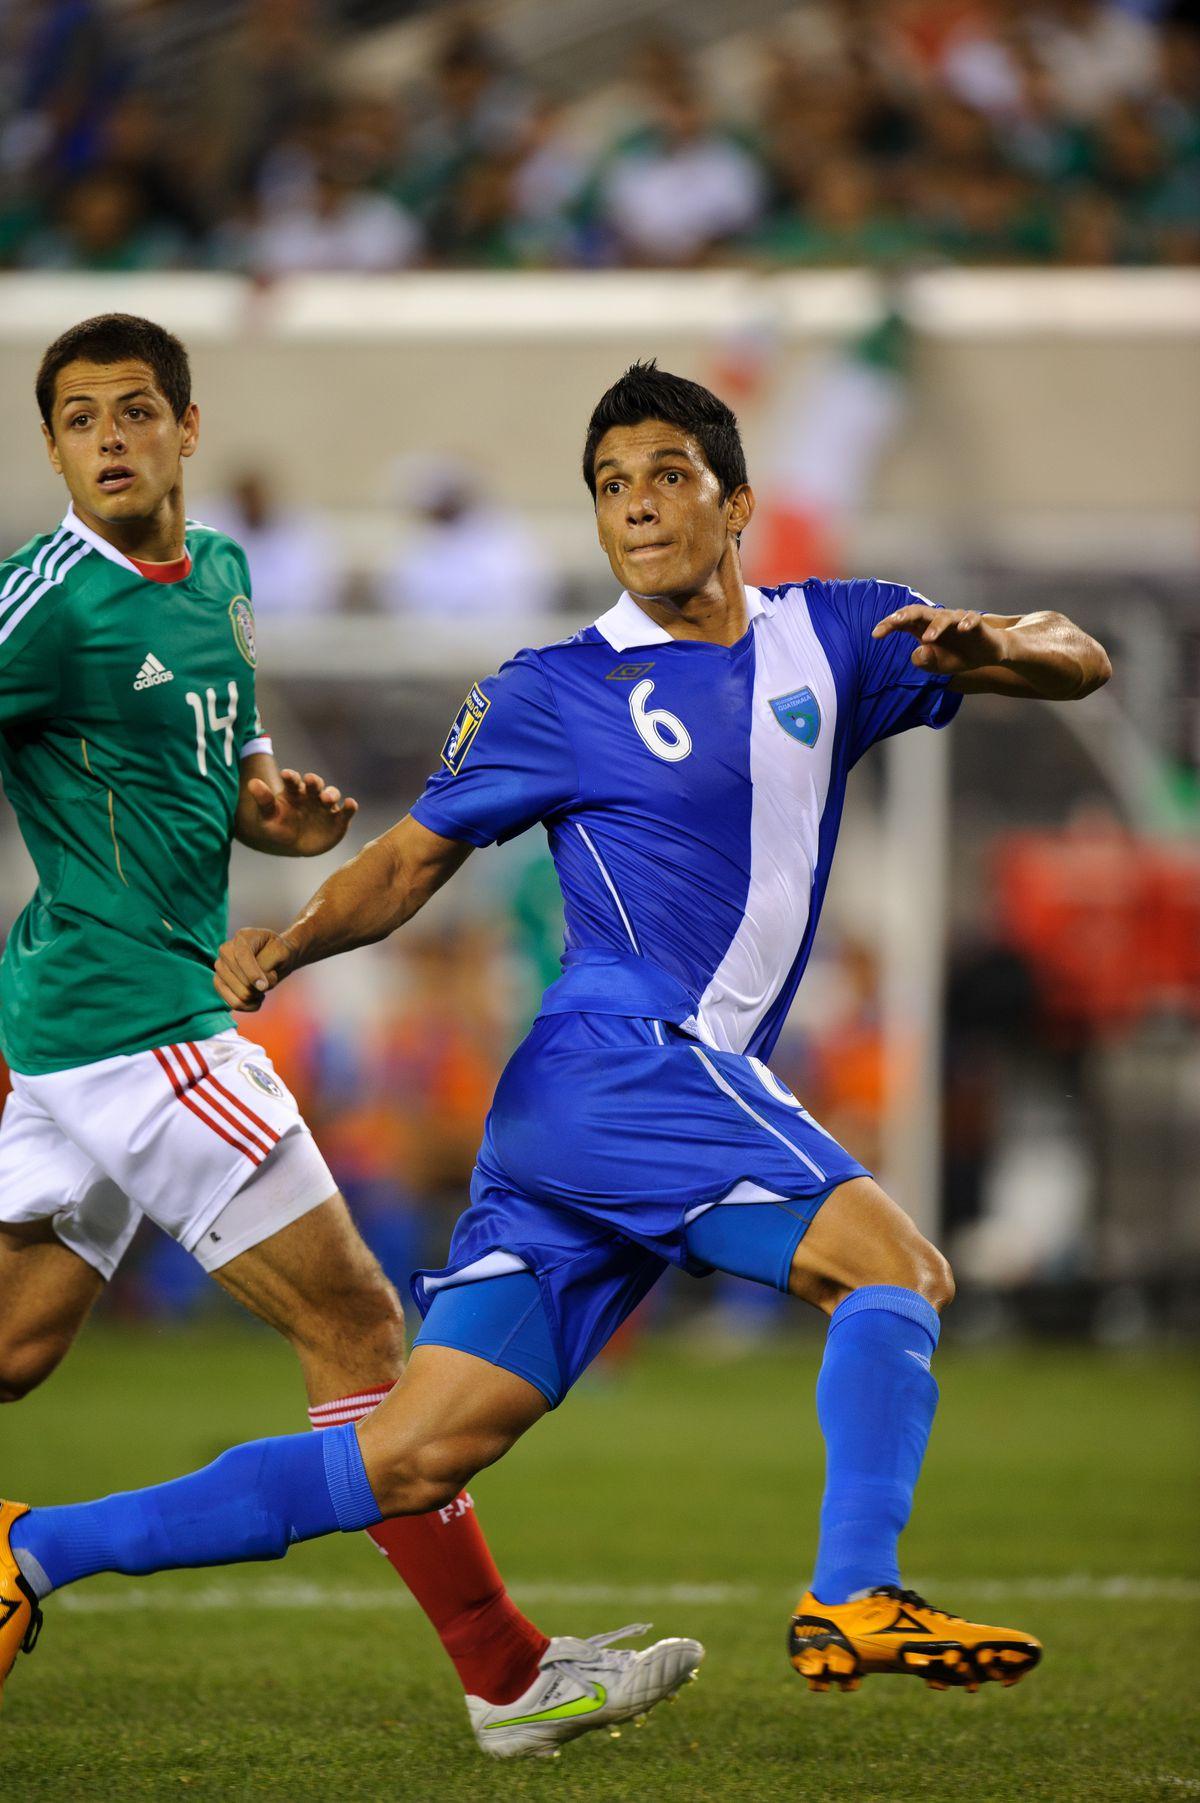 SOCCER - CONCACAF Gold Cup 2011 - Quarter Final - Mexico v Guatemala